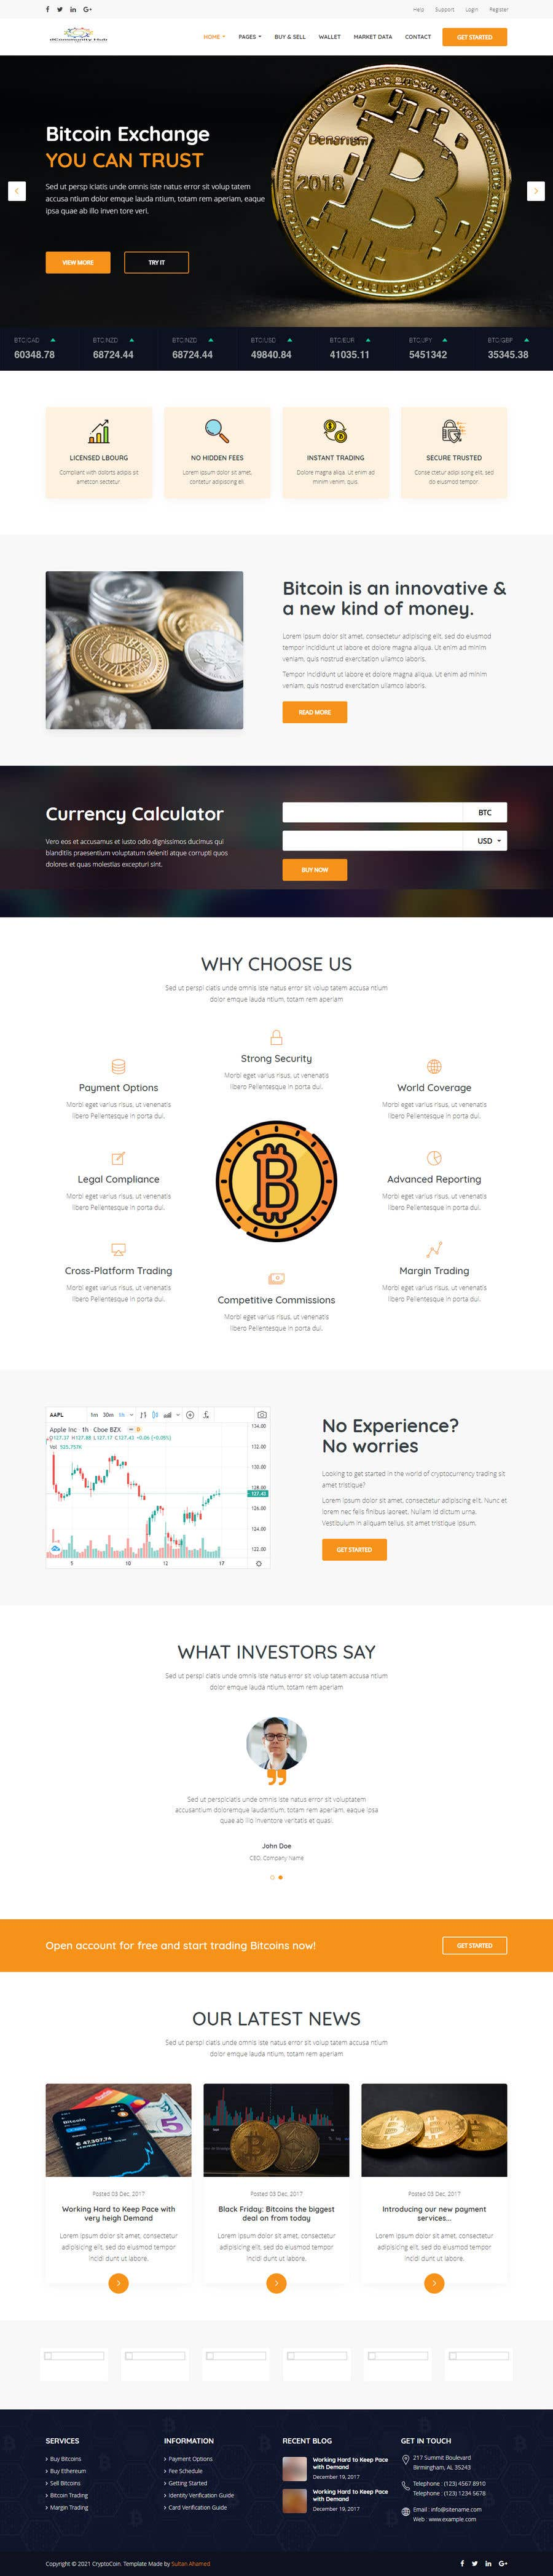 Penyertaan Peraduan #                                        12                                      untuk                                         Contest – Crypto Information Website Section: $100